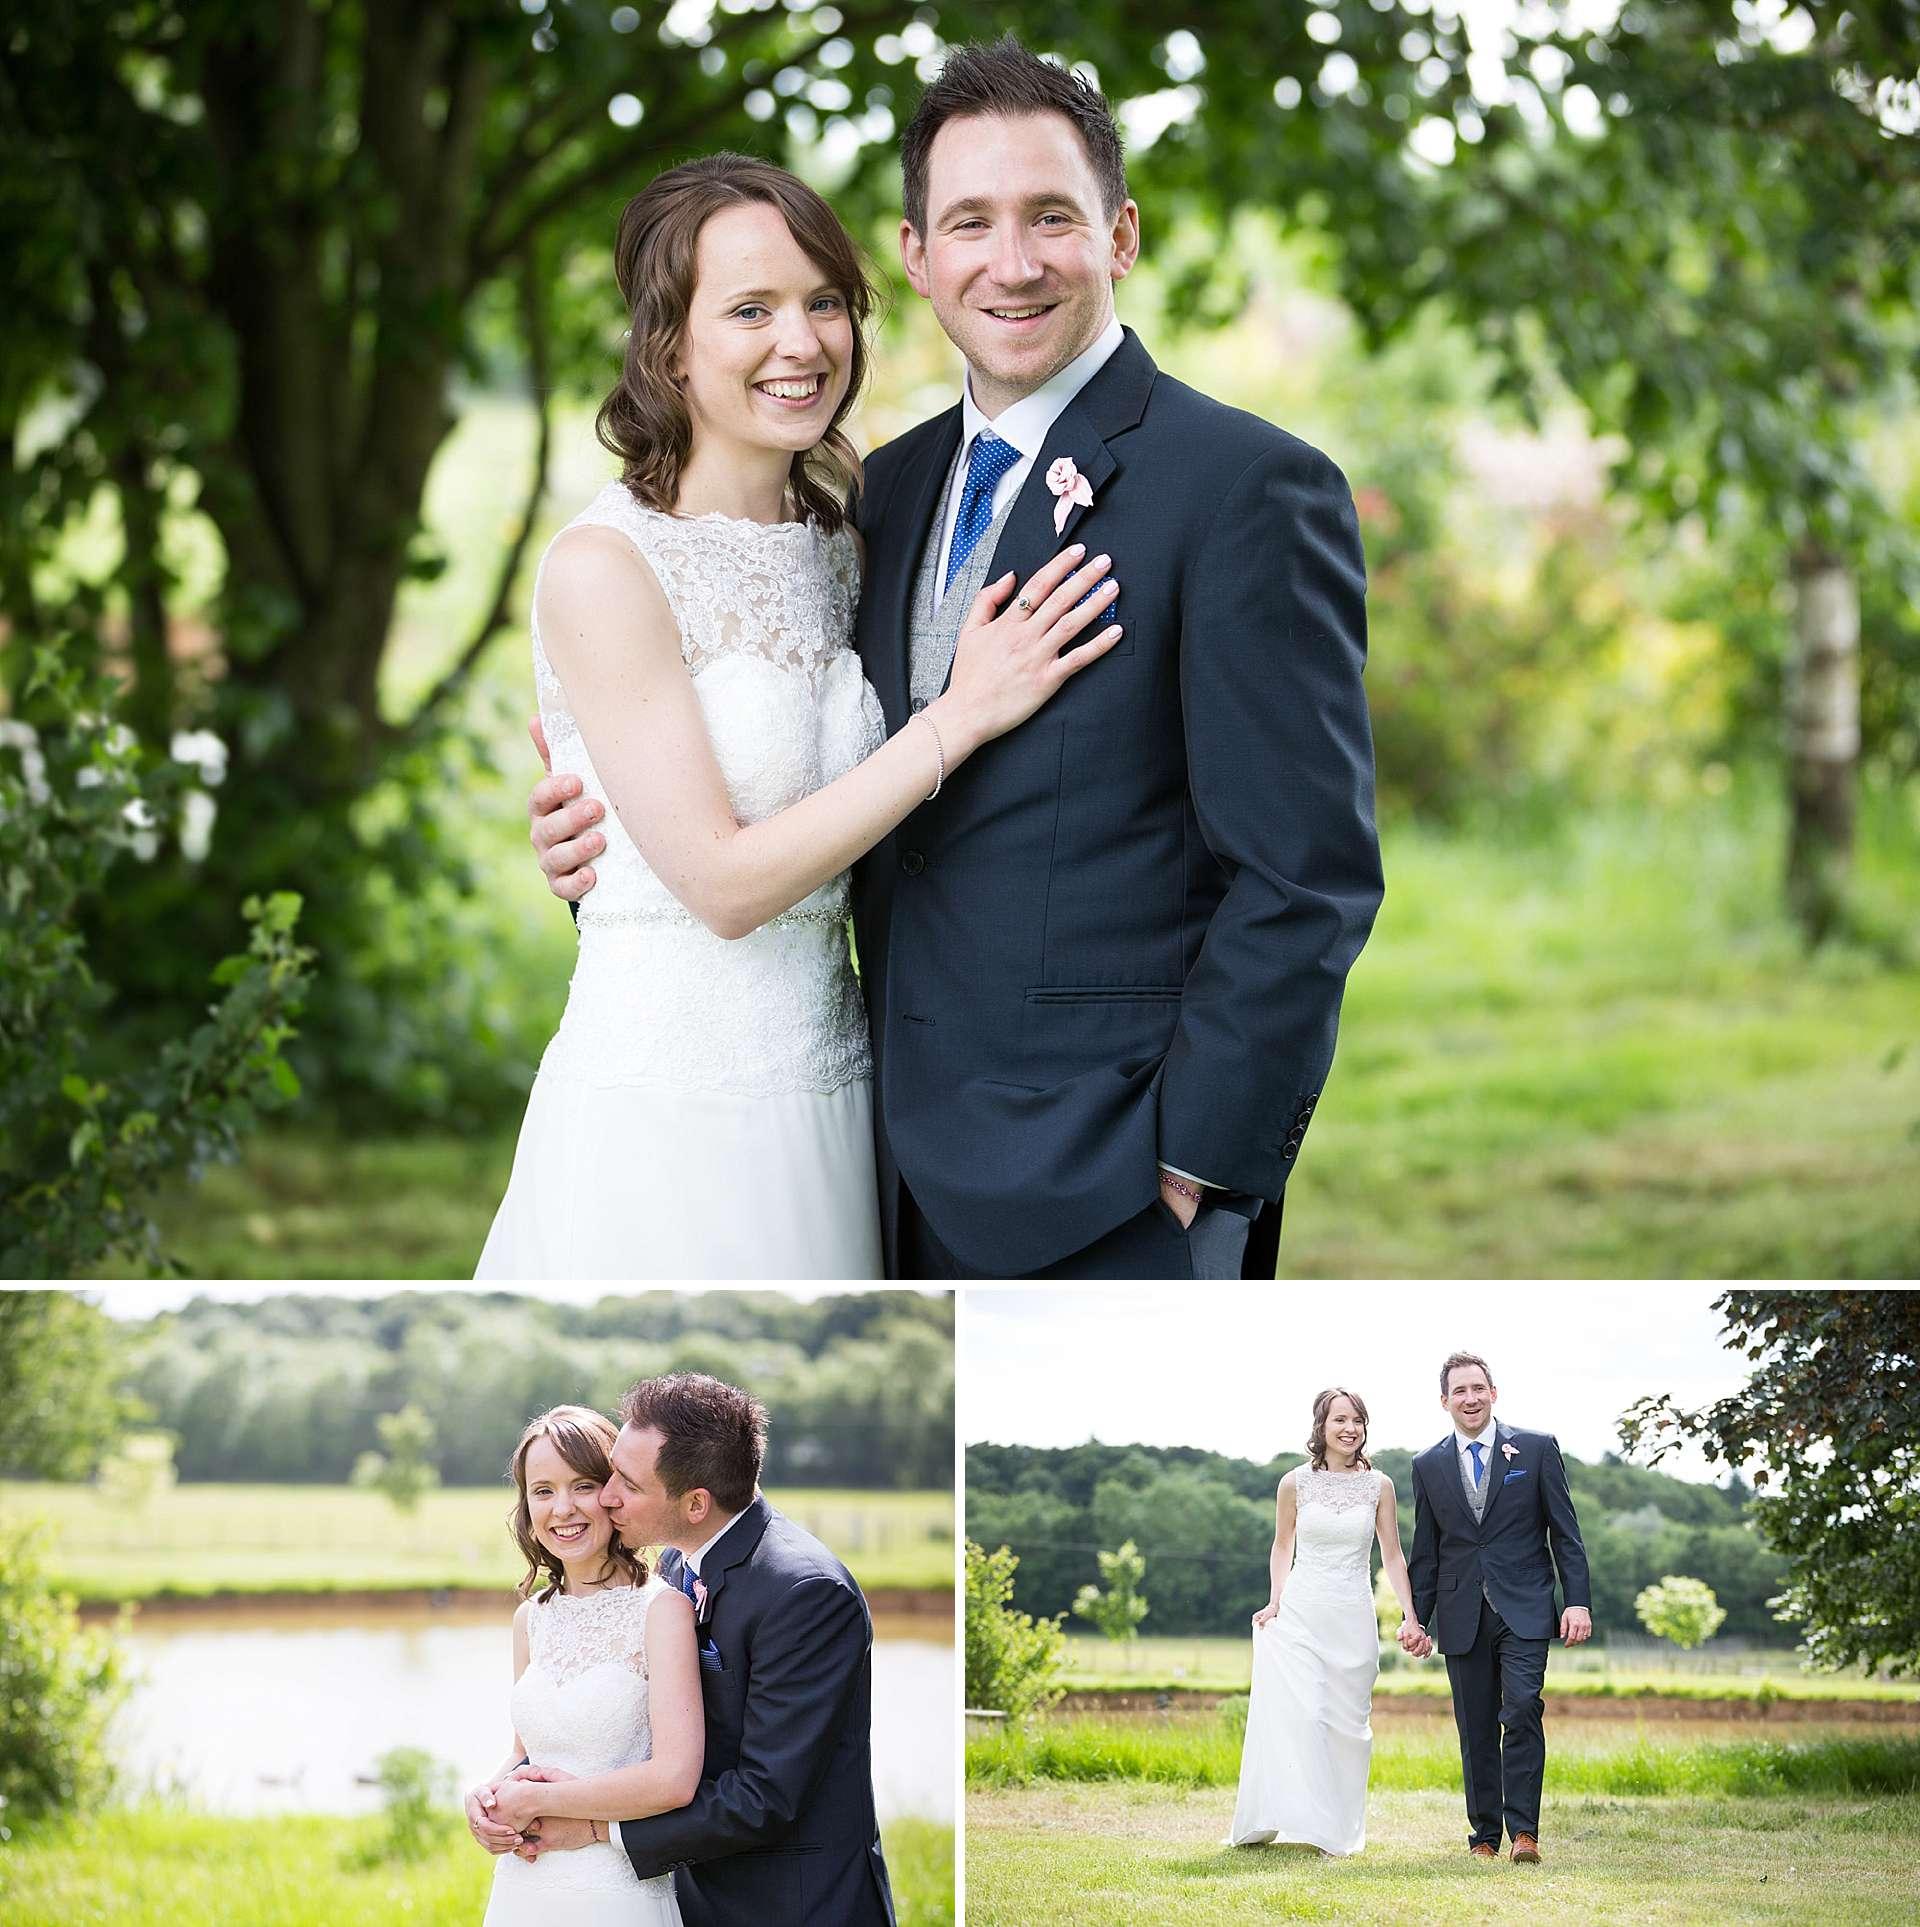 Jenny and Matt's Wokingham Wedding